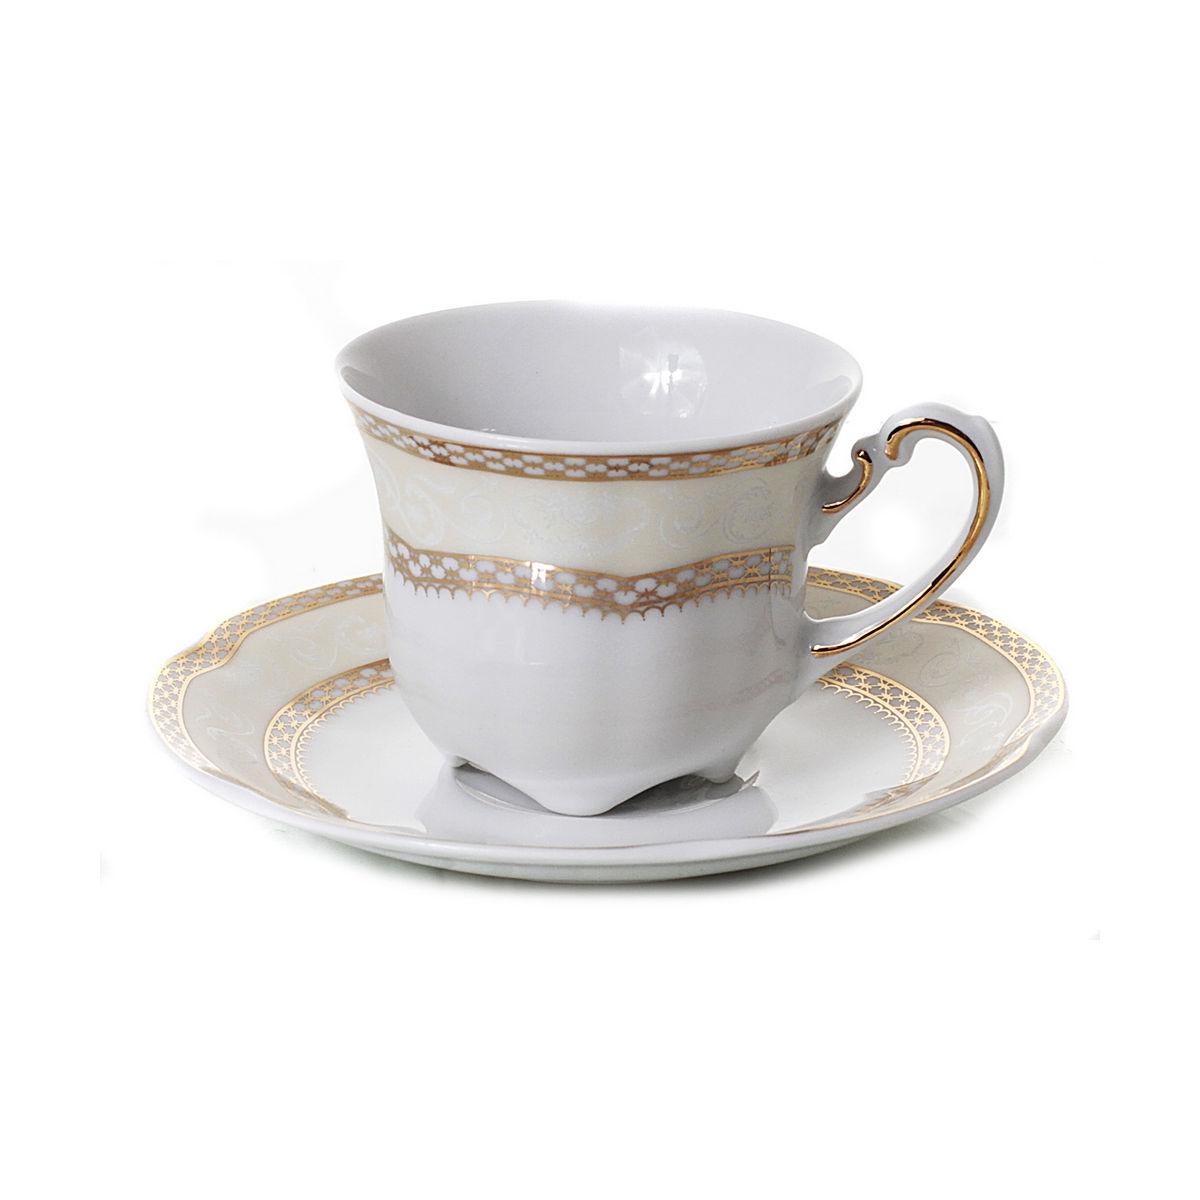 Sophia Serviciu Cafea Portelan 6 Persoane 100 Ml 2021 aranjareamesei.ro